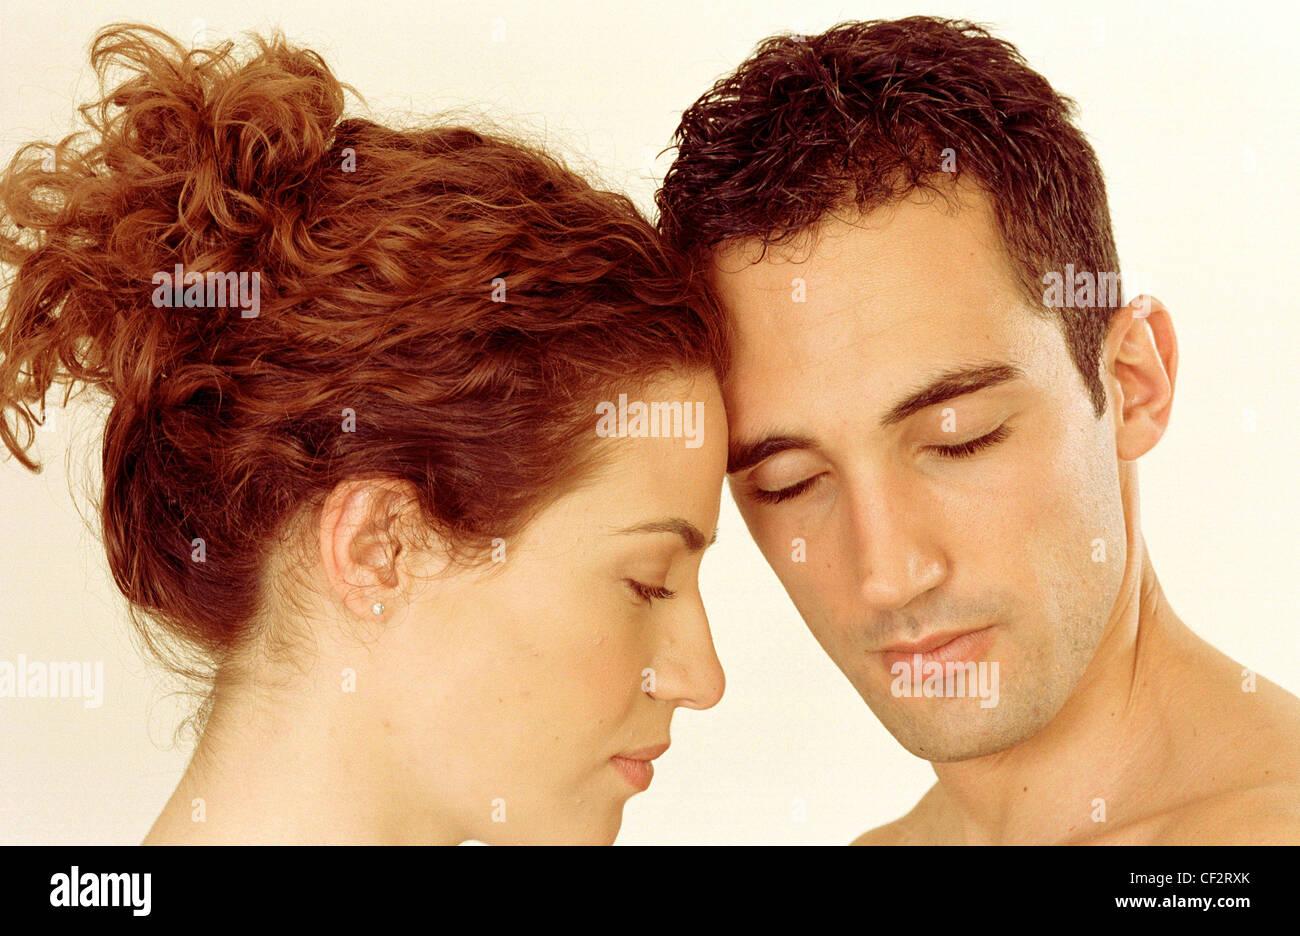 Perfil de mujer de pelo rojo rizado izquierdo fuera de cara a la izquierda  macho corto pelo castaño gira a cámara inclinándose en tocar frentes 9e6c09121f3